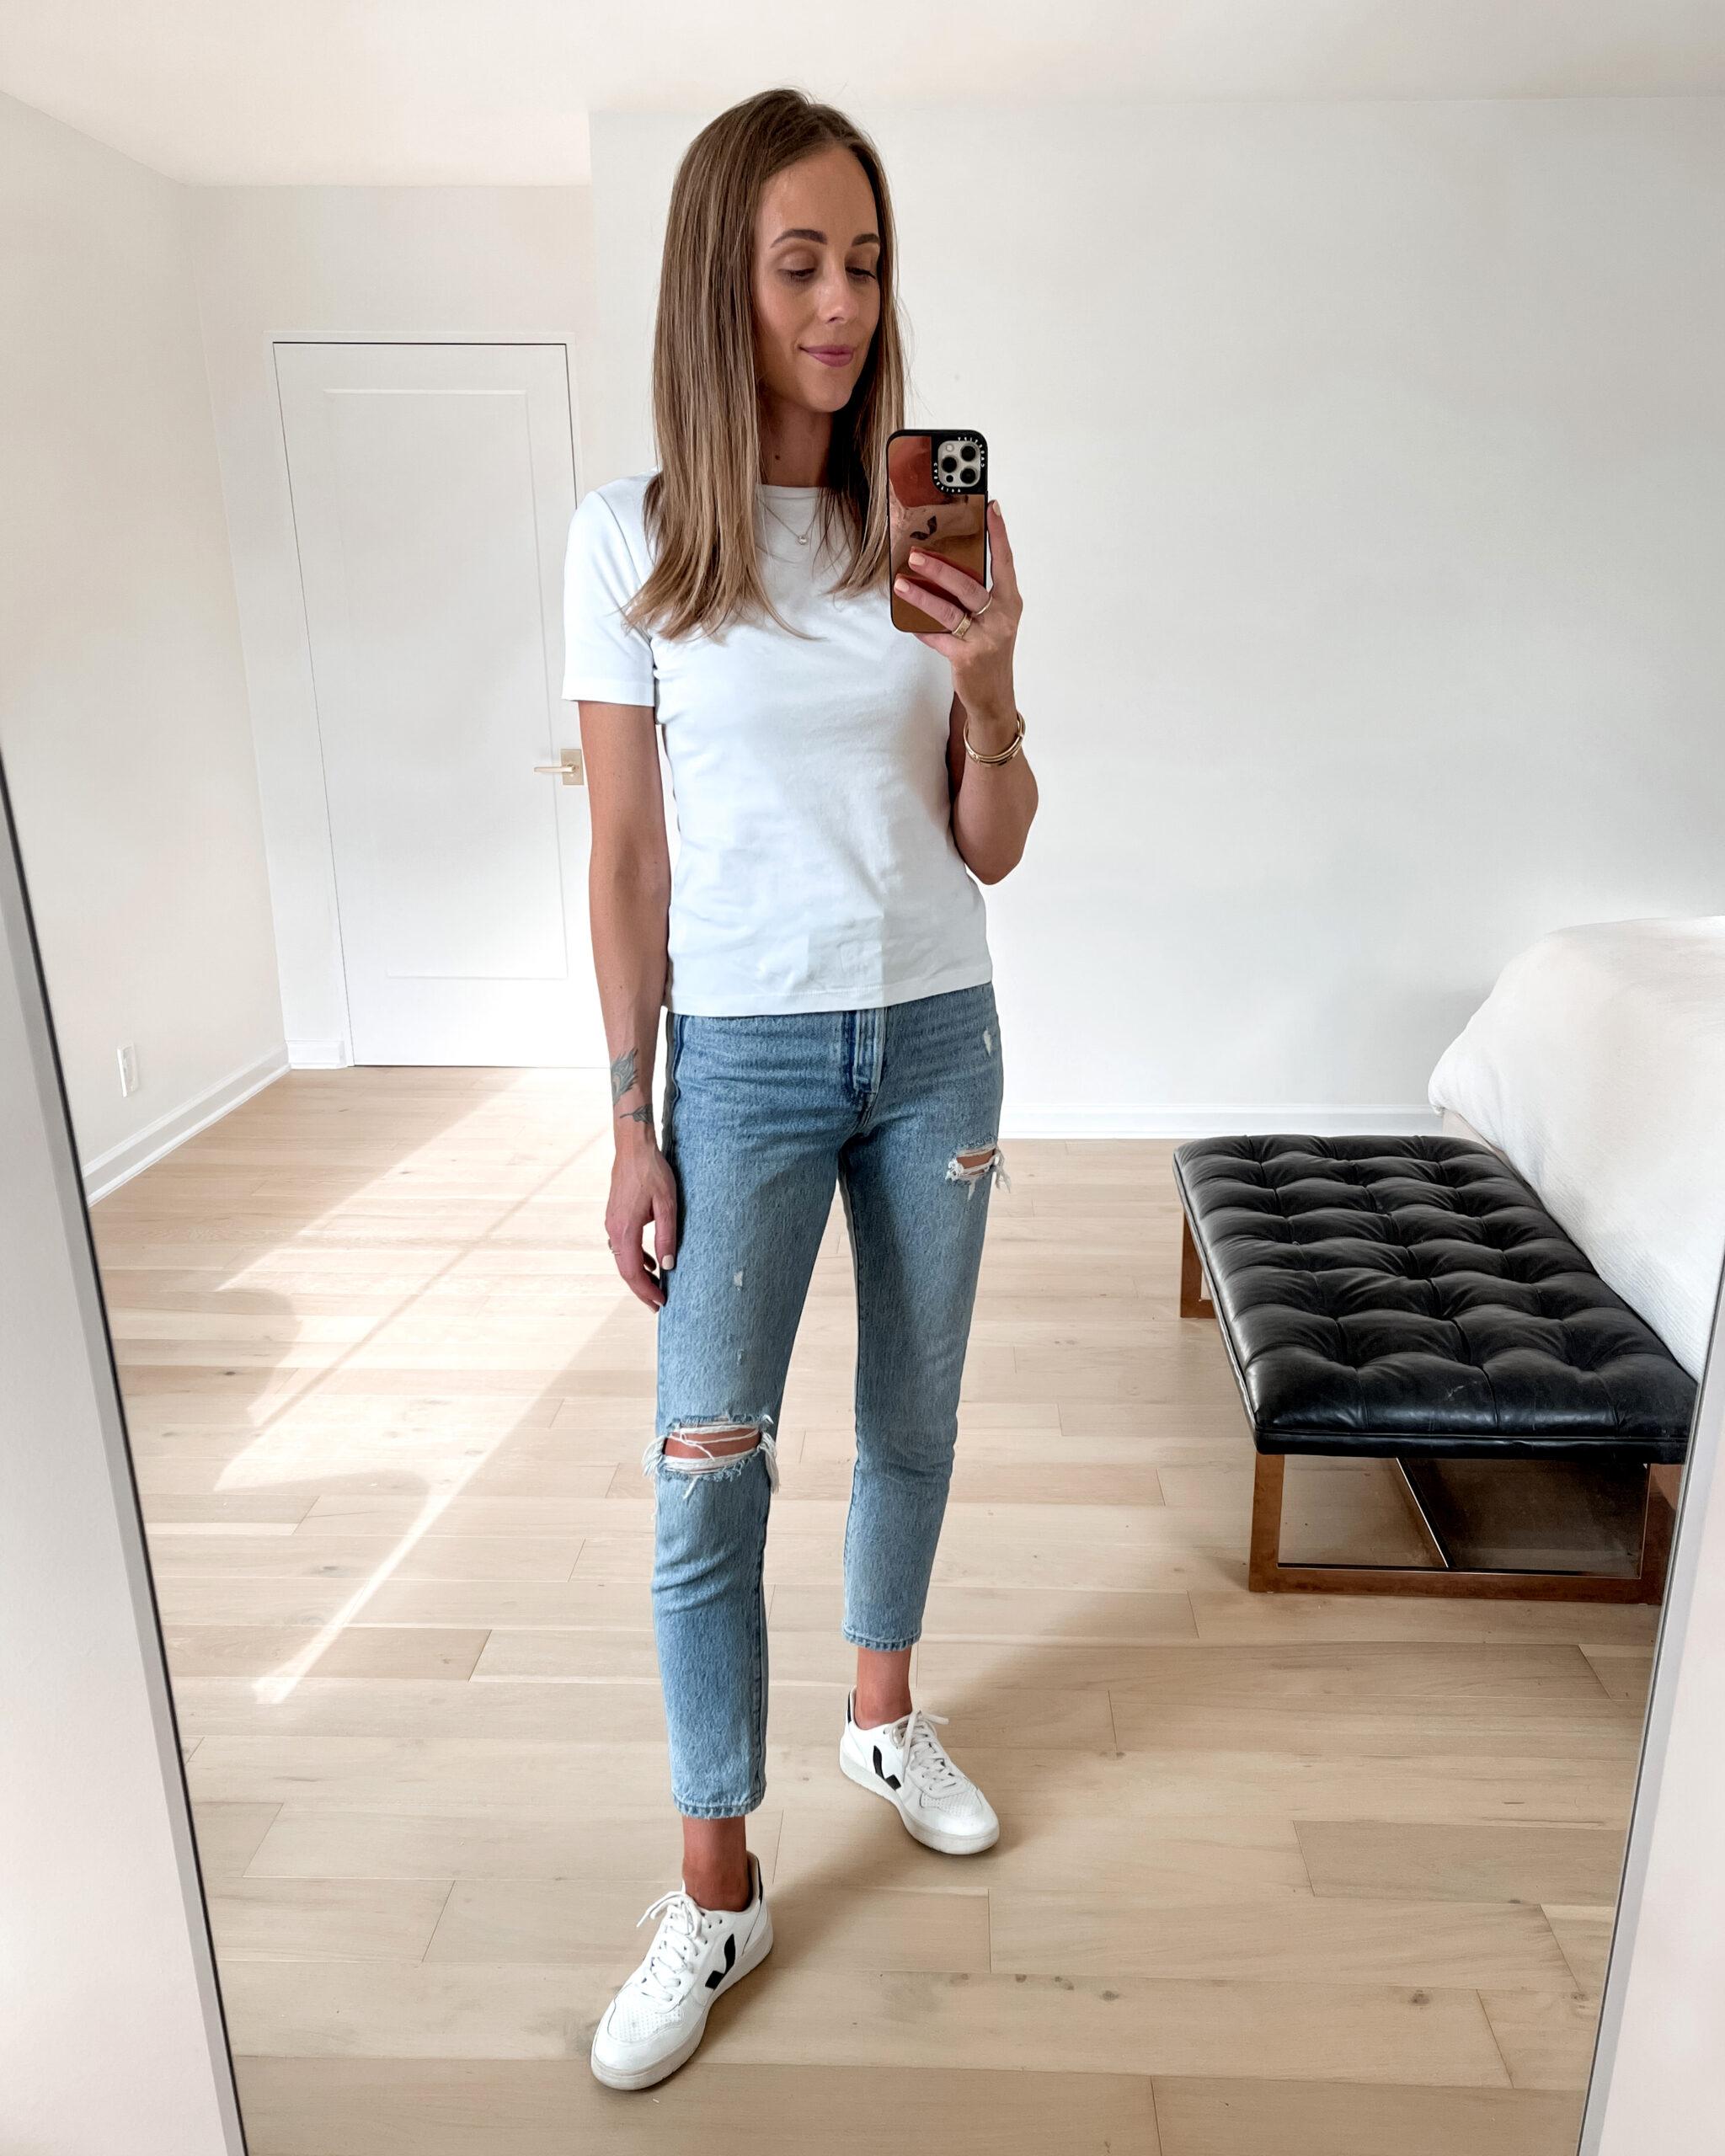 Fashion Jackson Amazon Fashion Made For You White Crewneck Tshirt